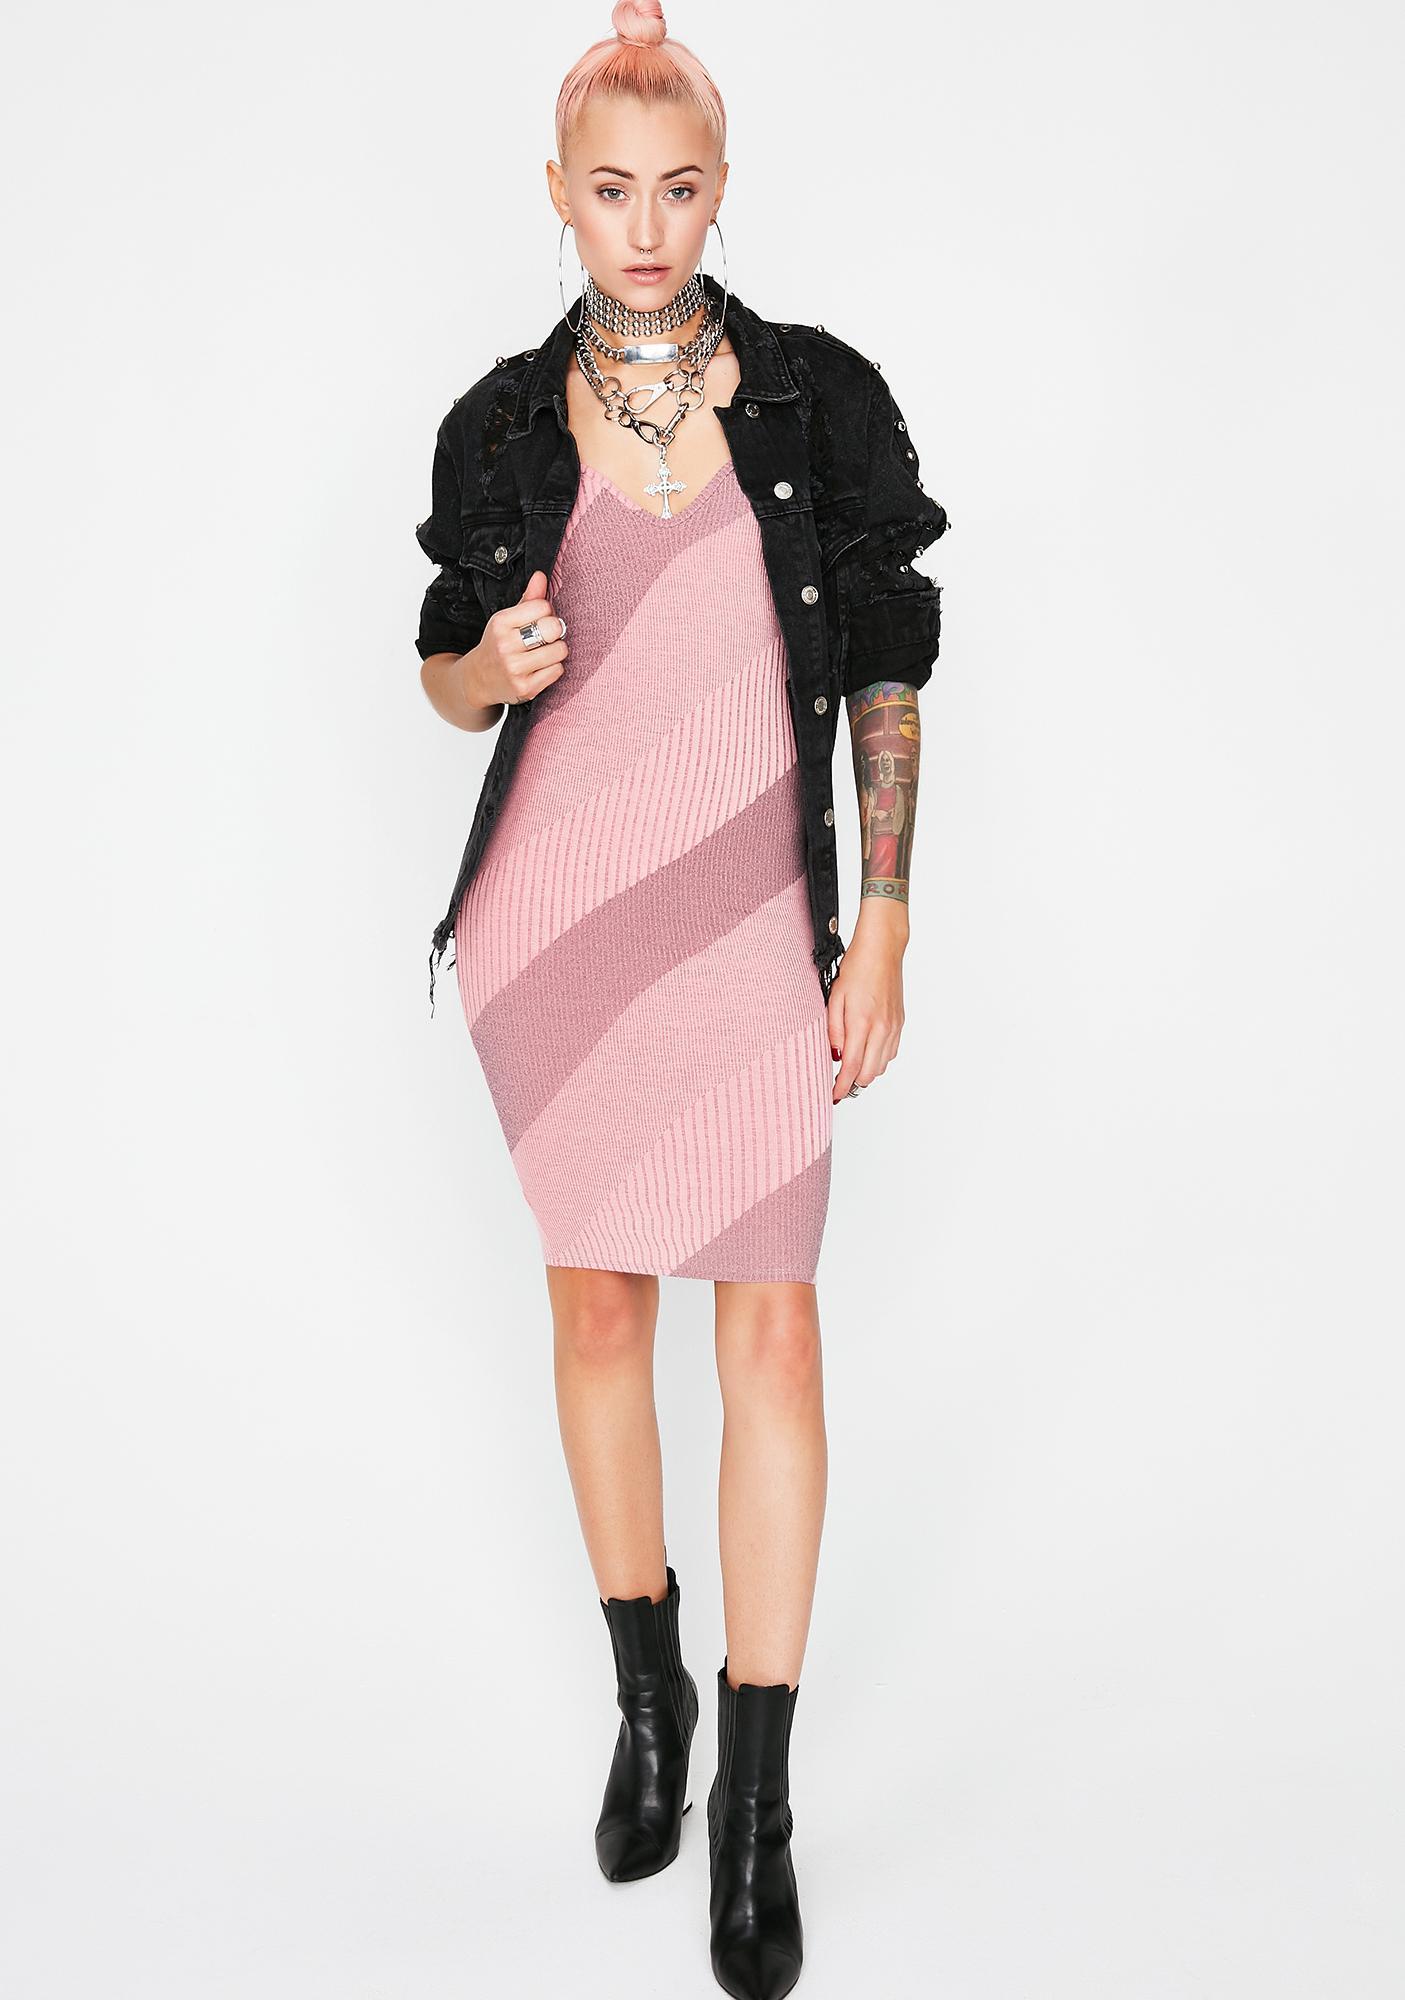 Attention Addict Stripe Dress